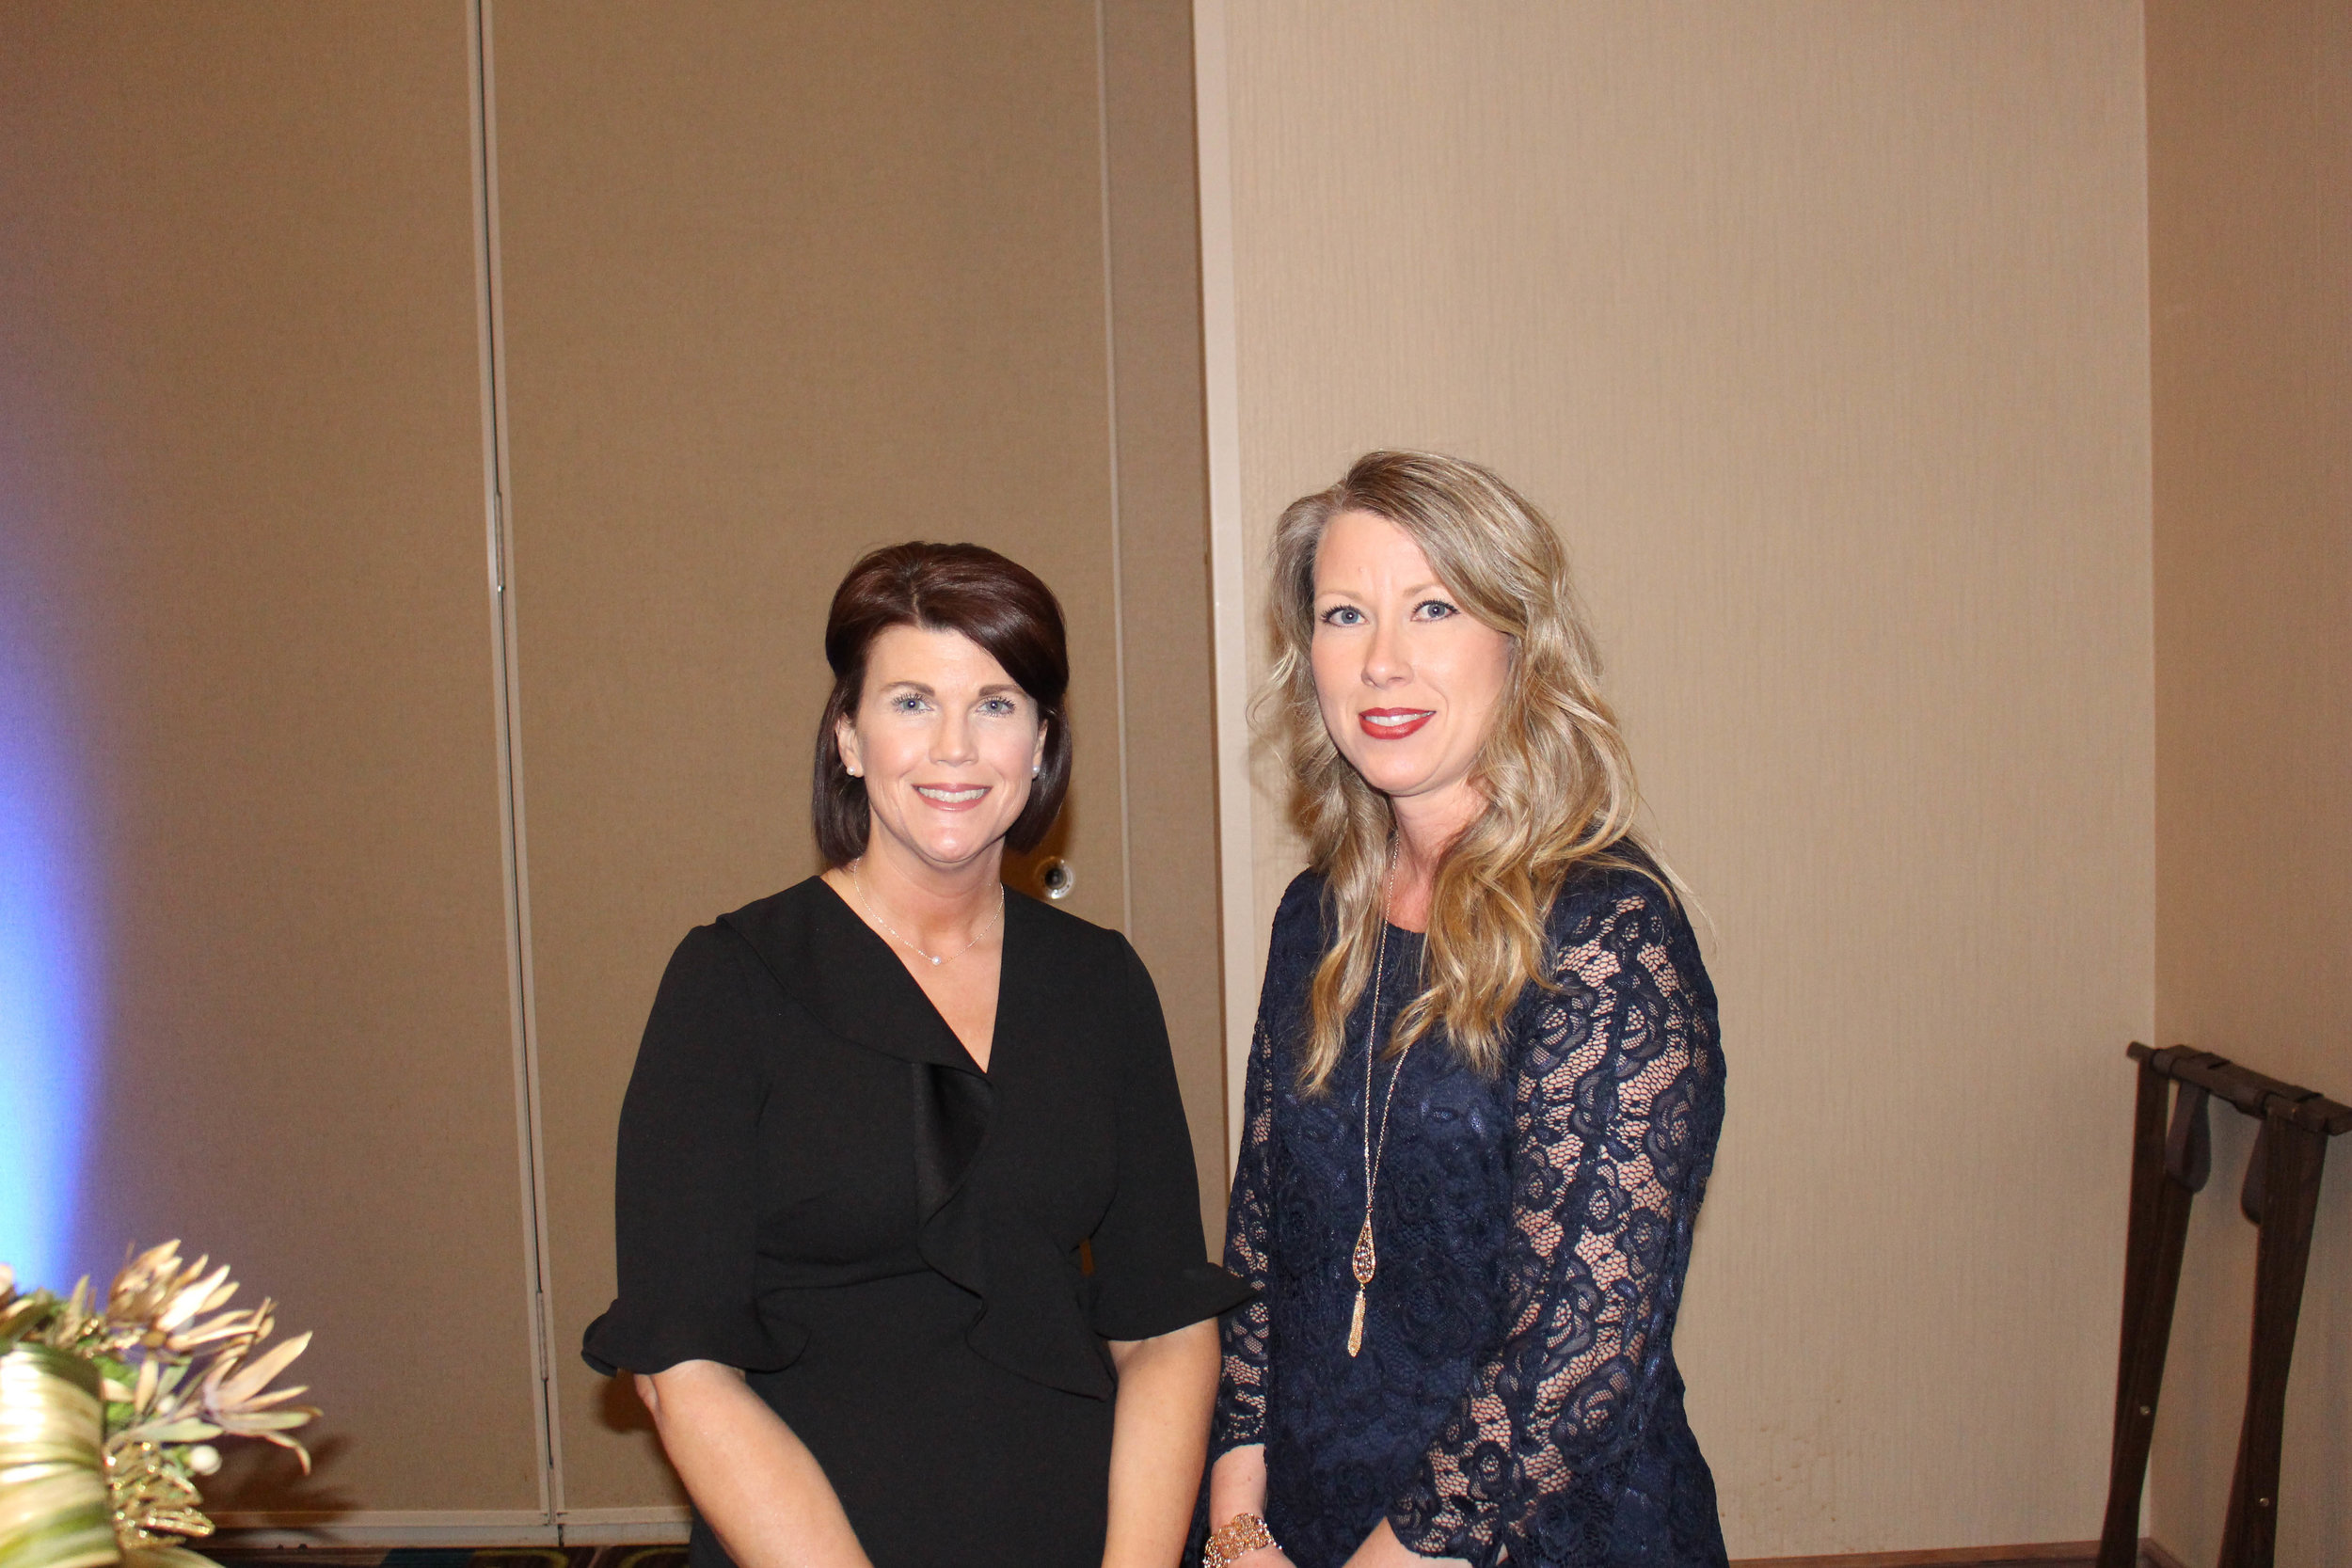 Stephanie Carver and Kellea Baker